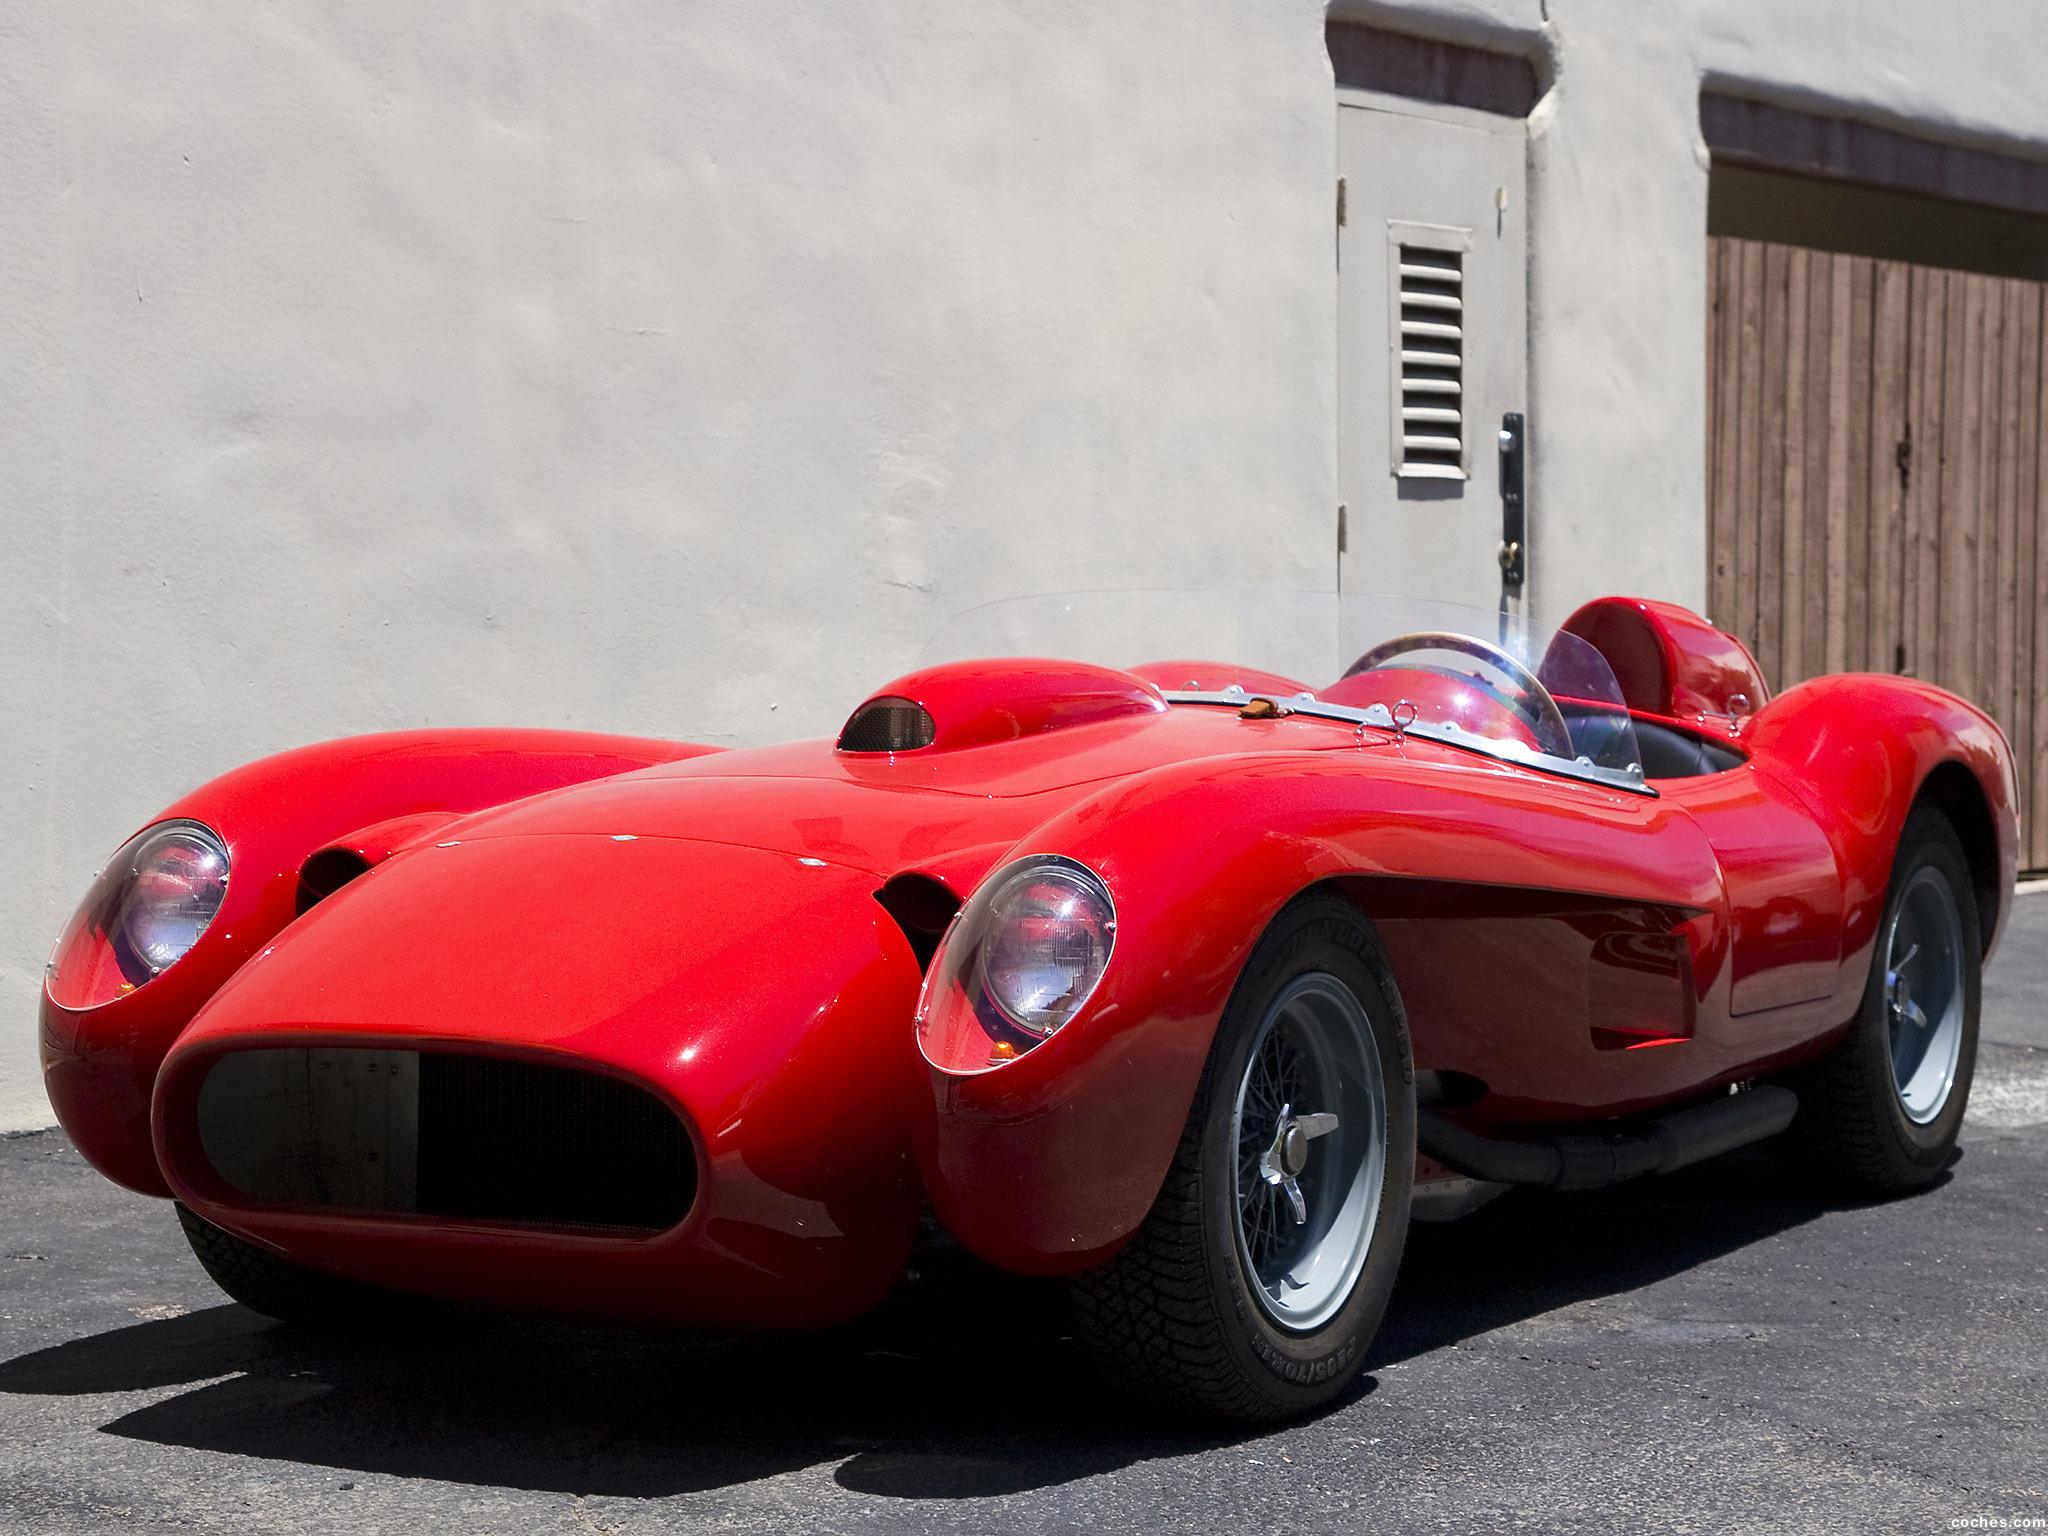 Foto 0 de Ferrari 250 Testa Rossa Recreation by Tempero SN 6301 1965